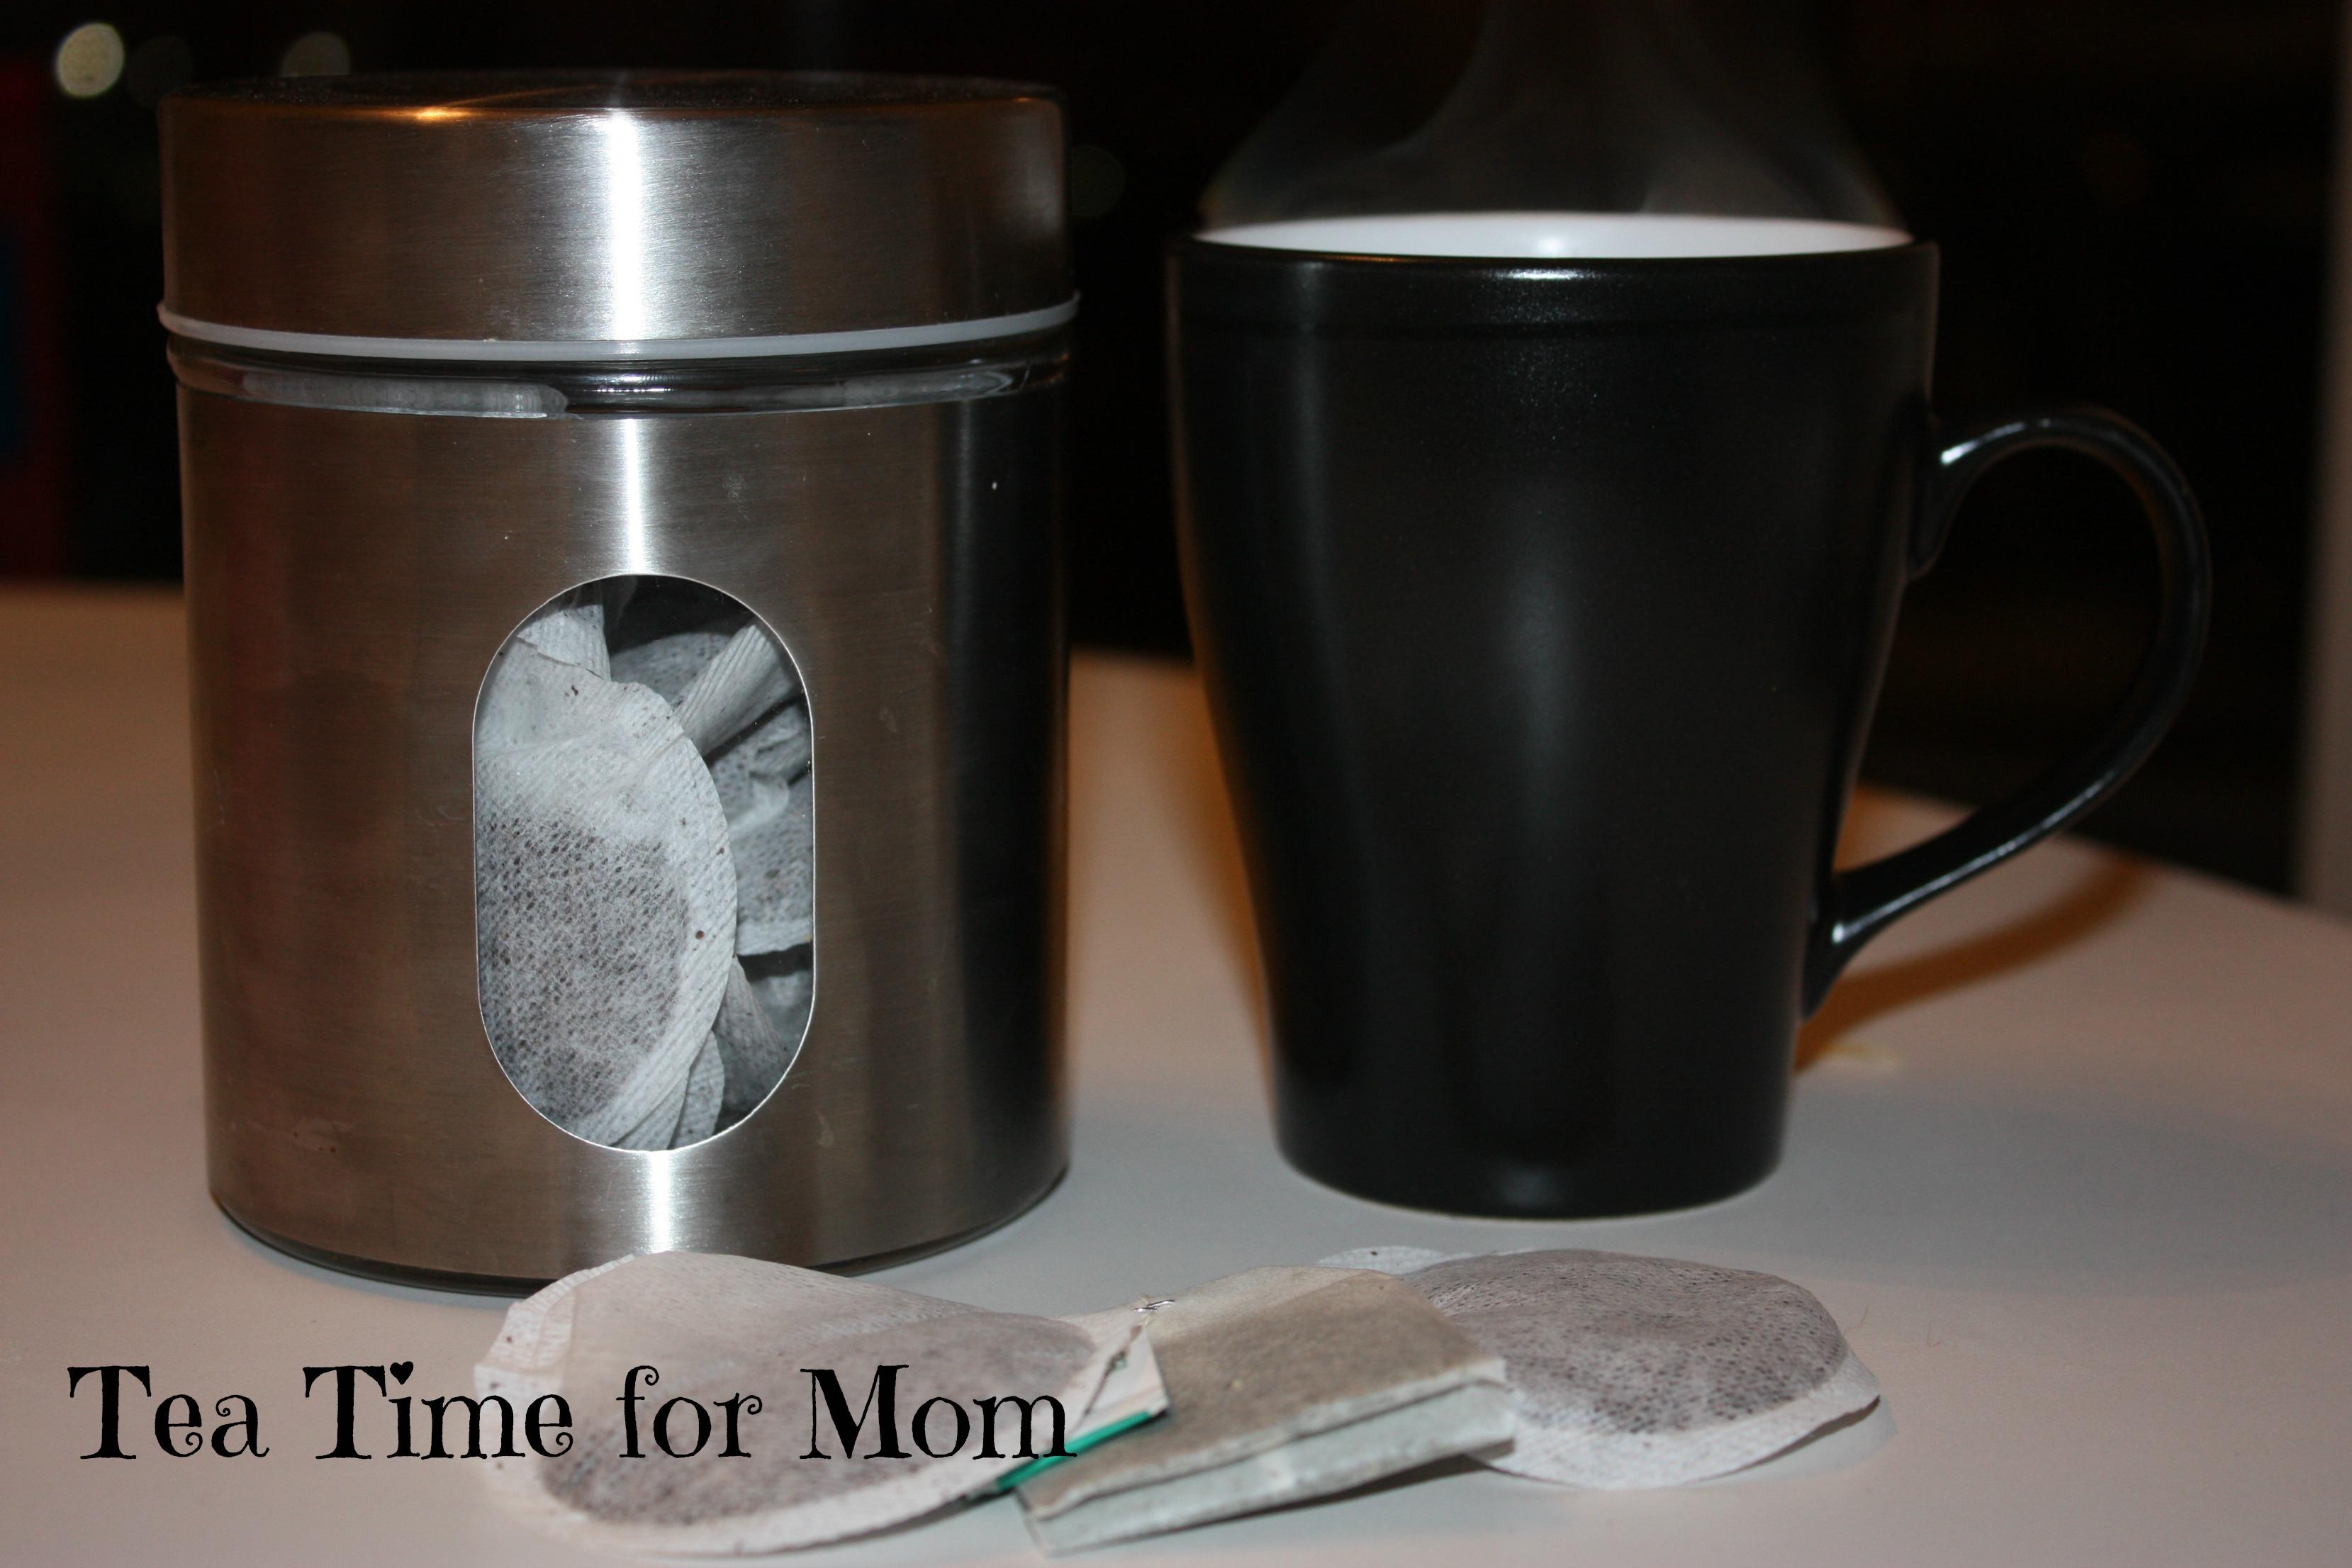 tea time for mom